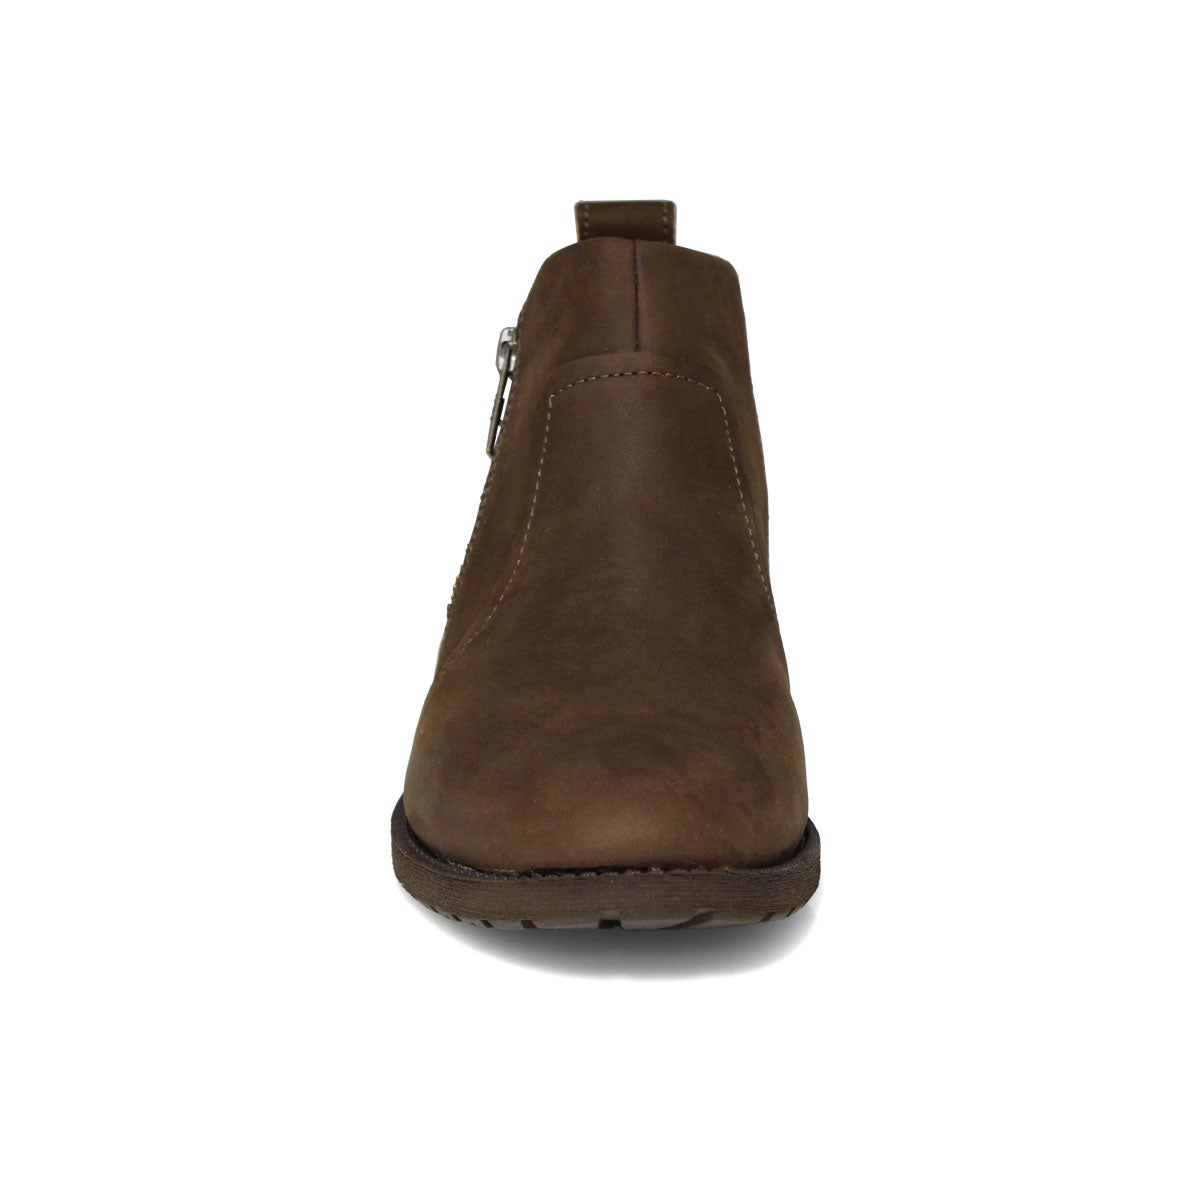 Women's AUREO II pinewood waterproof booties